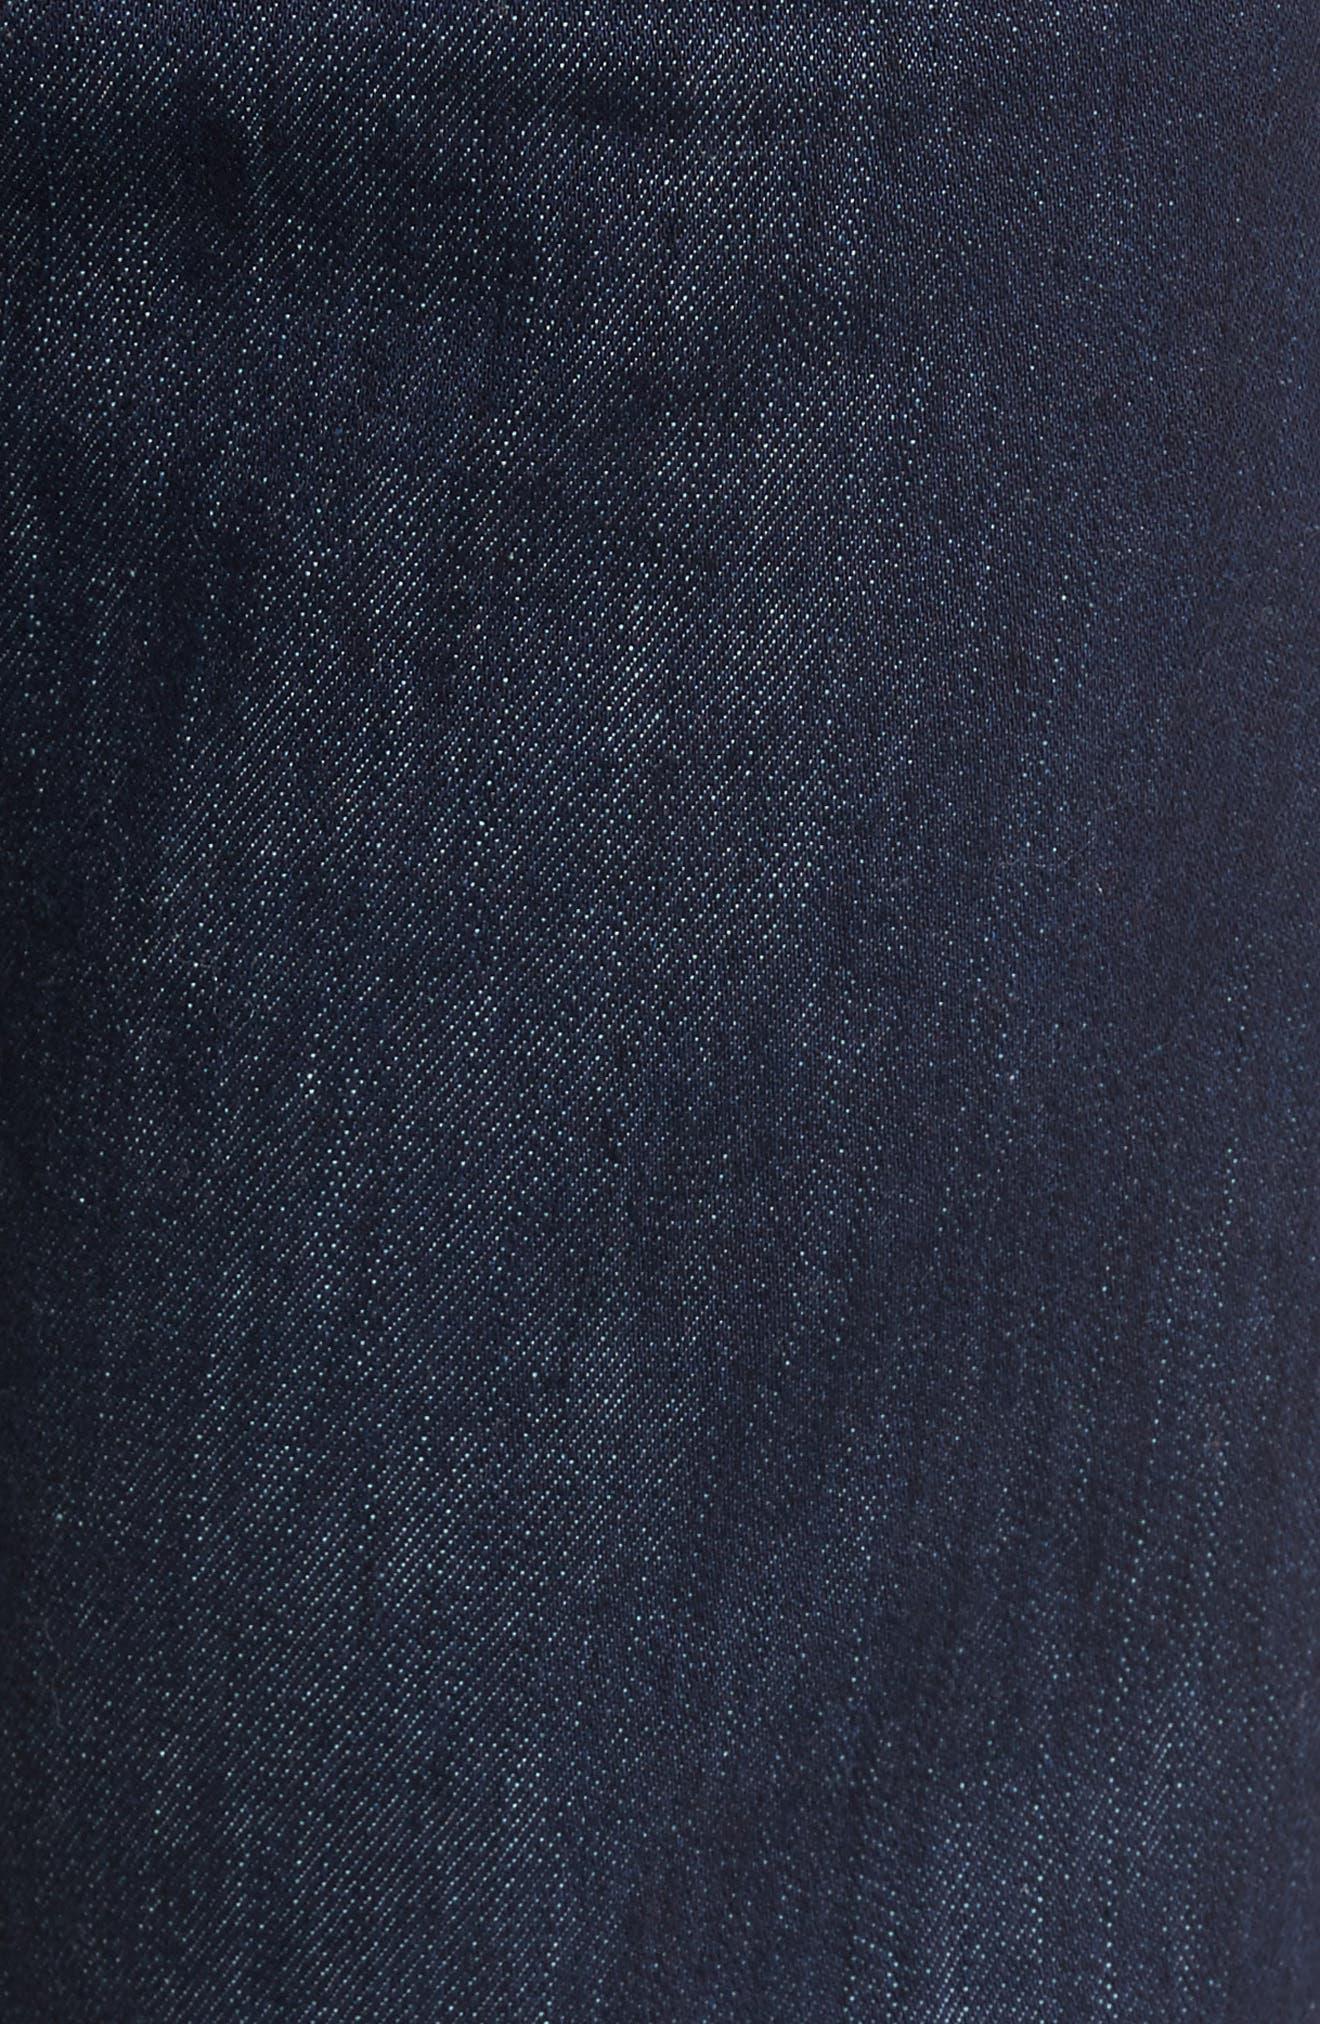 Jones Slim Fit Jeans,                             Alternate thumbnail 5, color,                             418